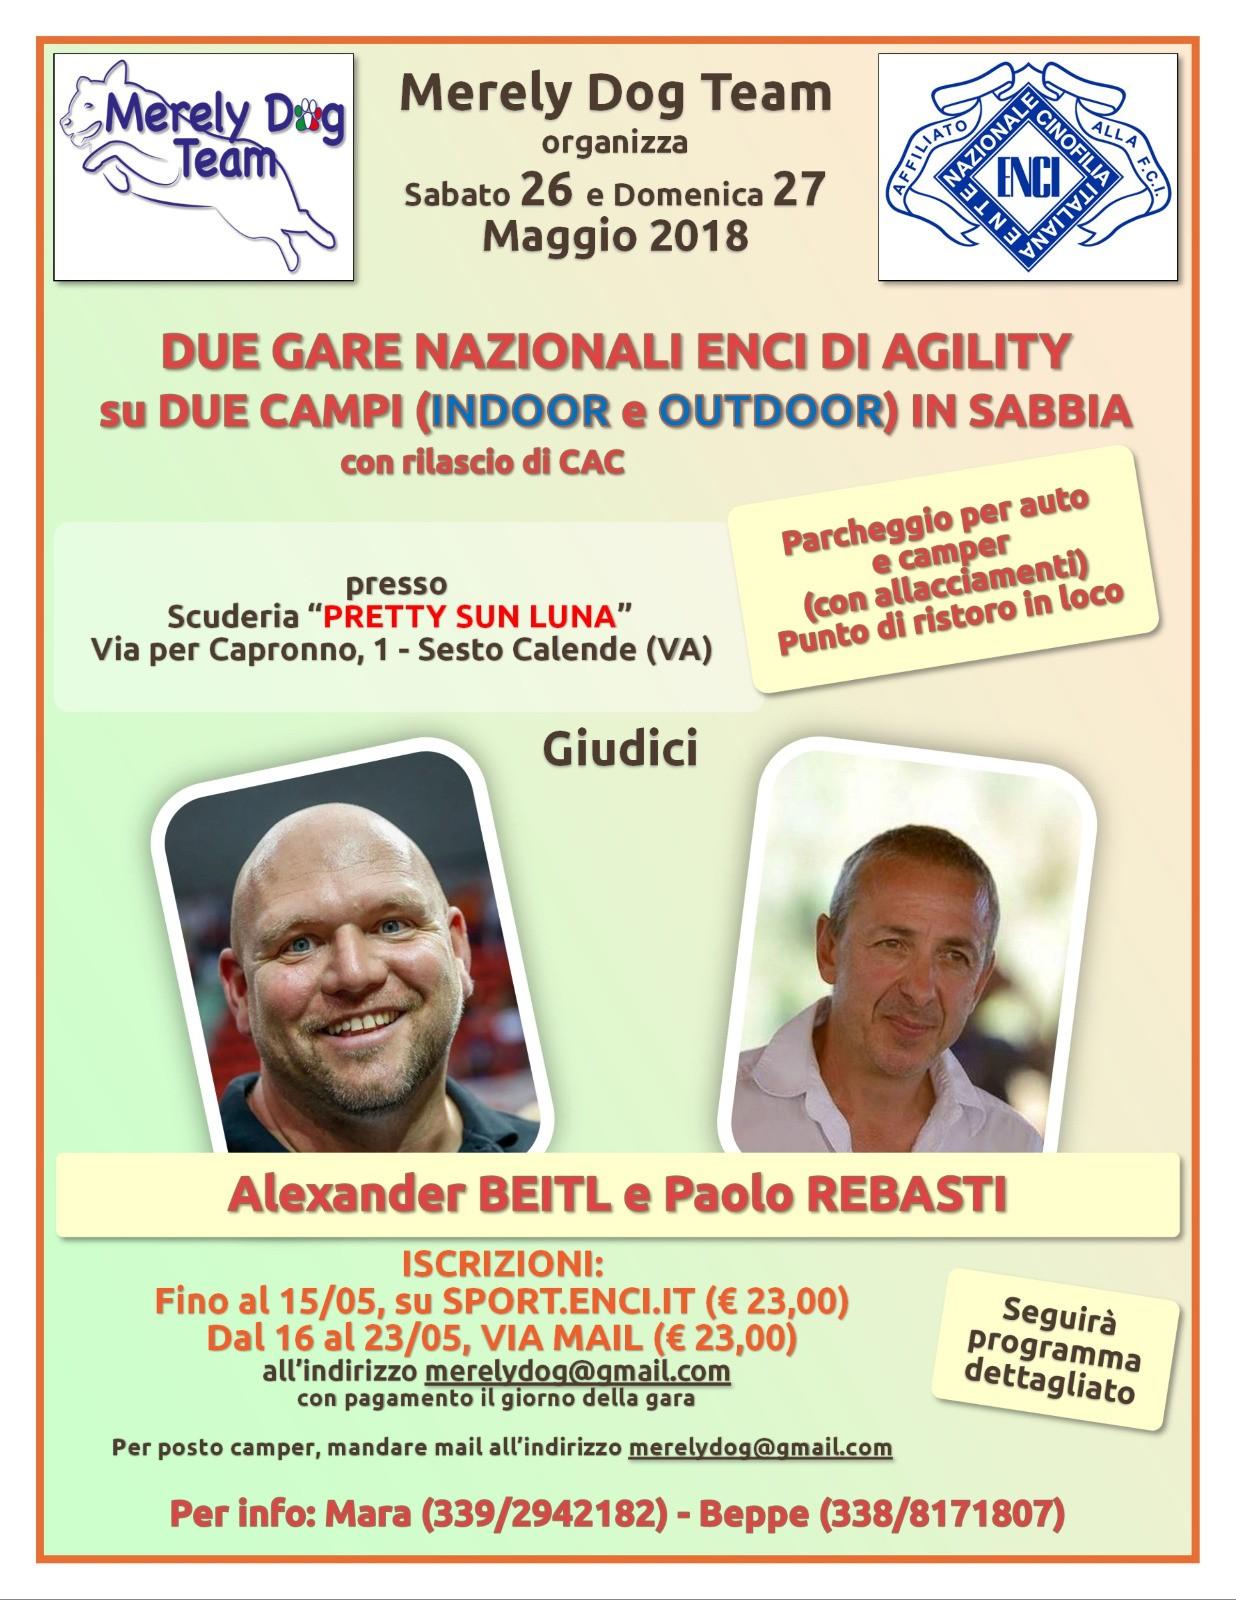 Sabato 26 Maggio Merely Dog Team Organizza